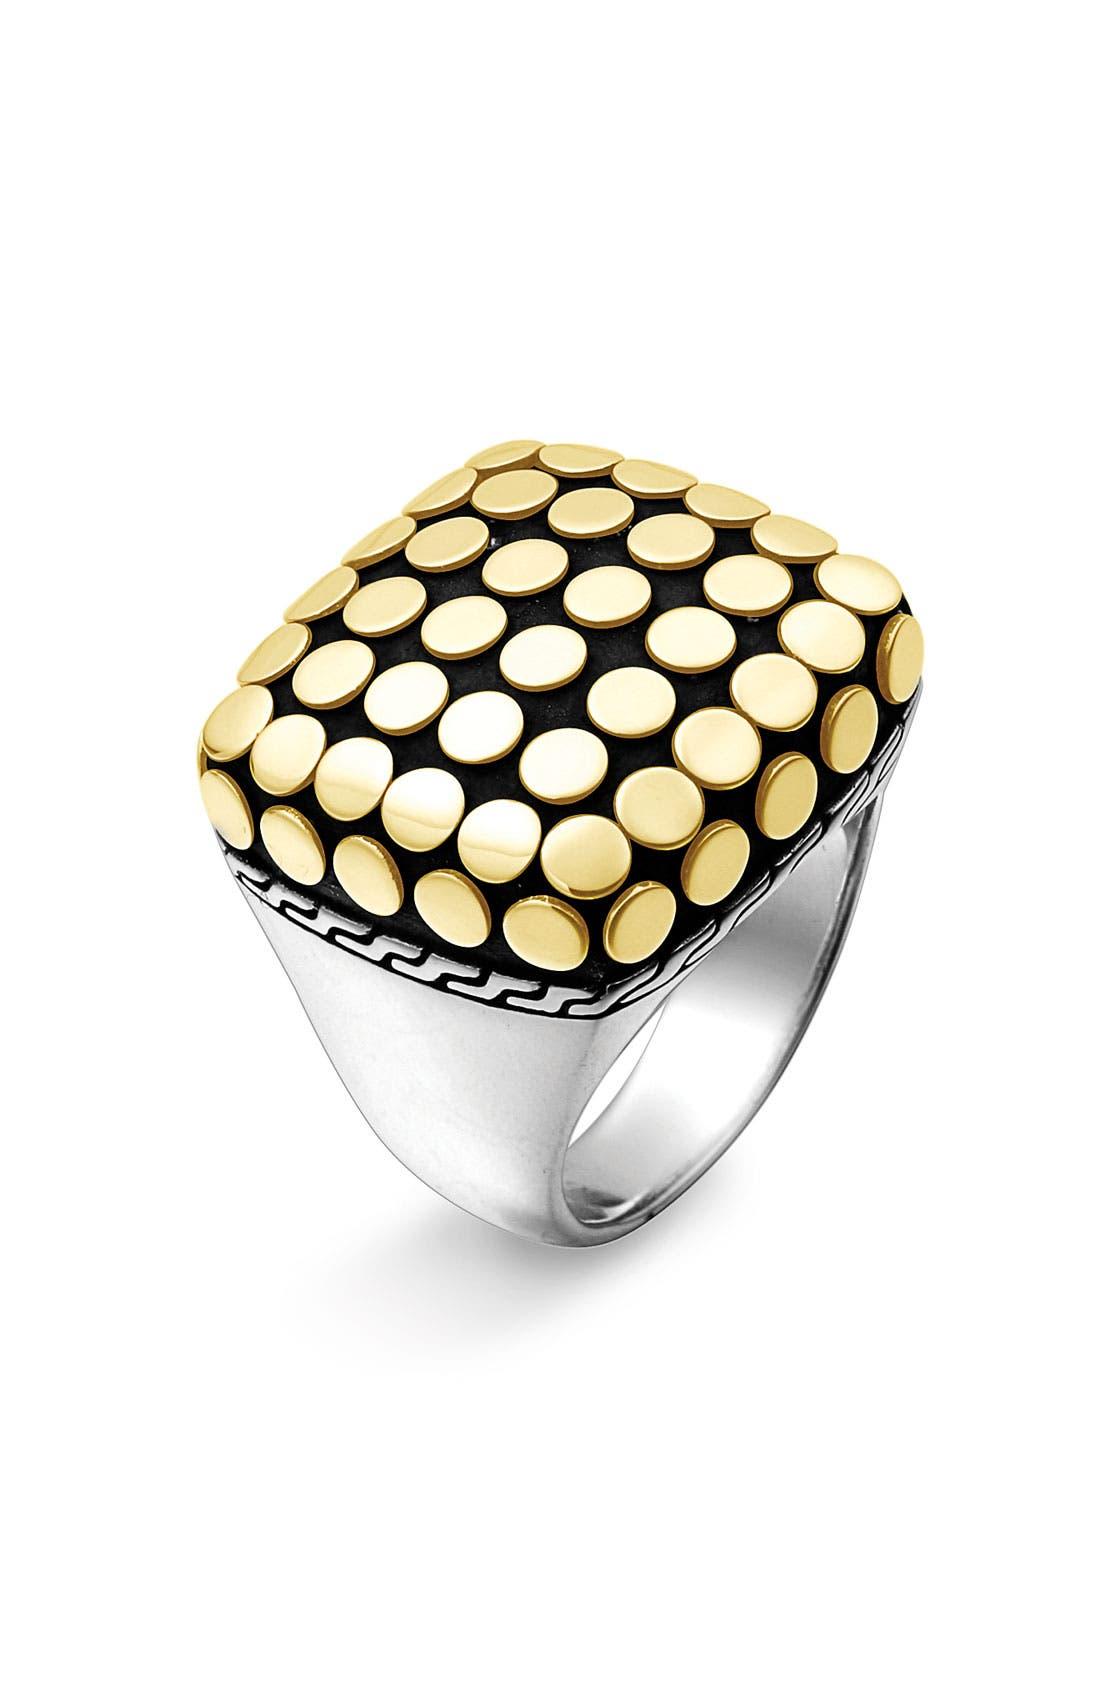 Alternate Image 1 Selected - John Hardy 'Dot Gold' Square Ring